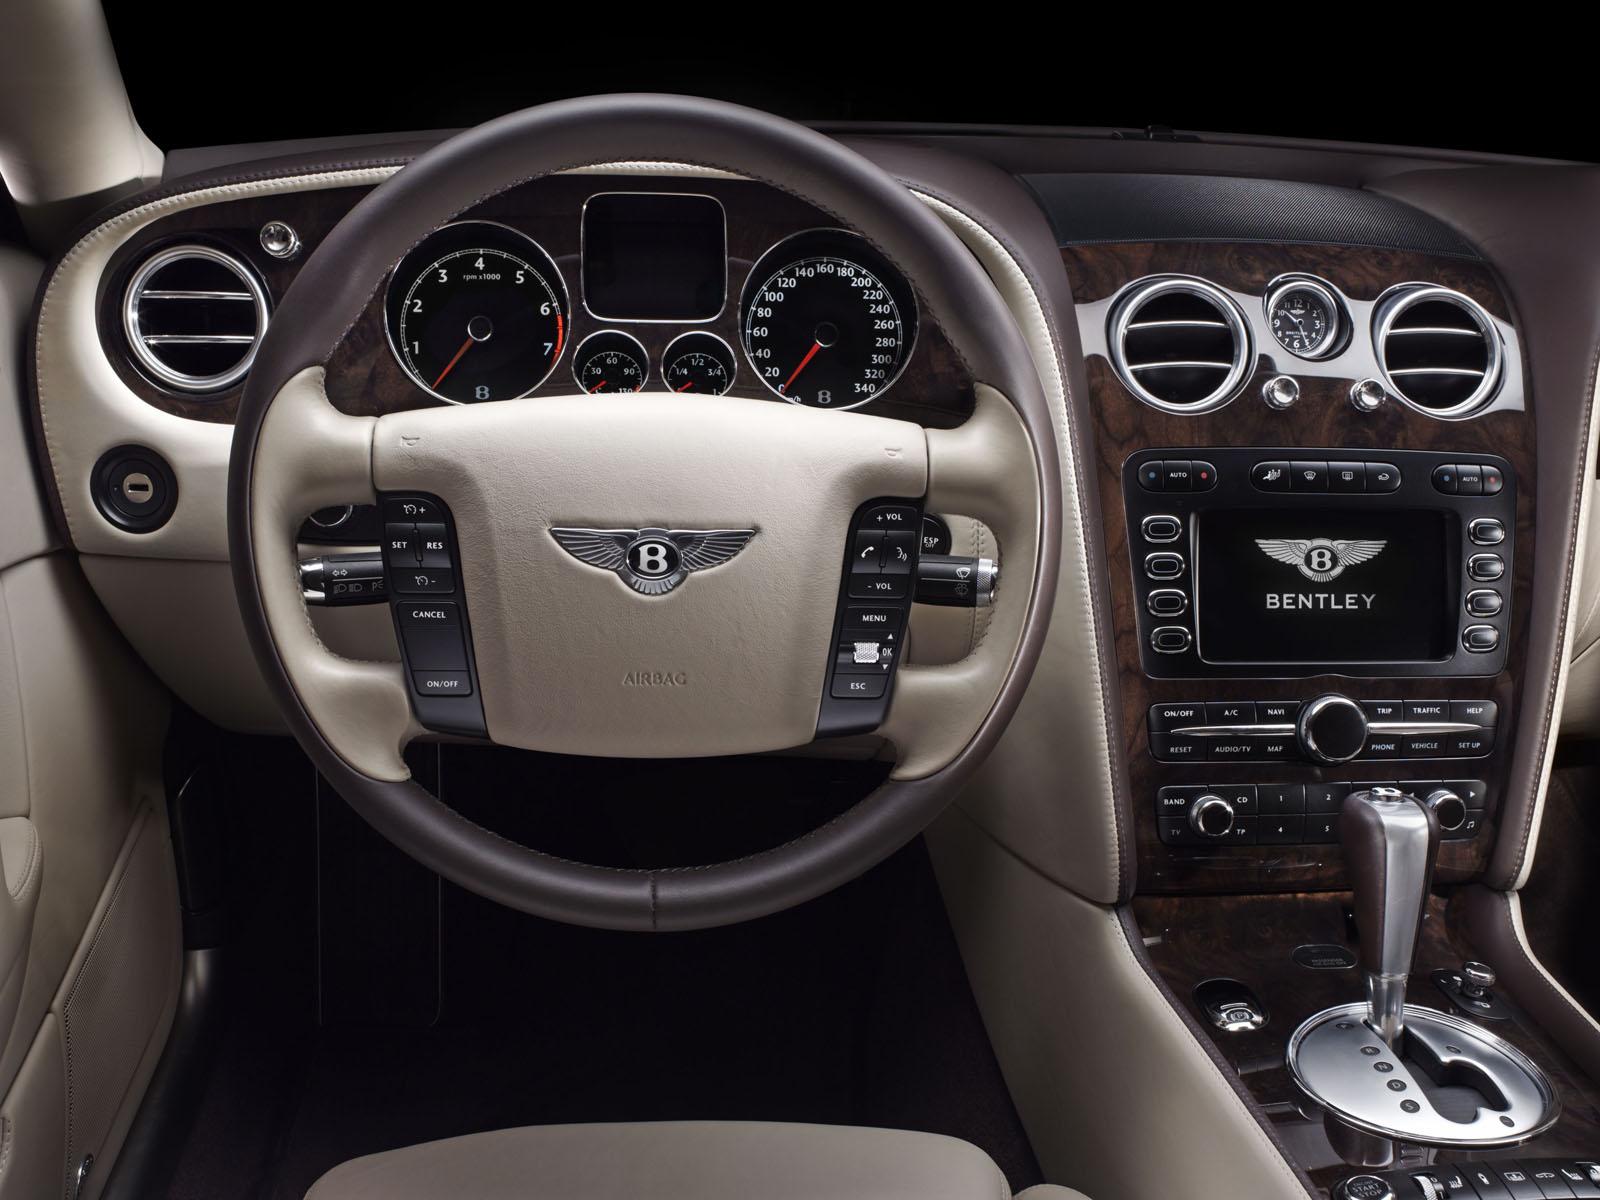 bentley interior car models. Black Bedroom Furniture Sets. Home Design Ideas